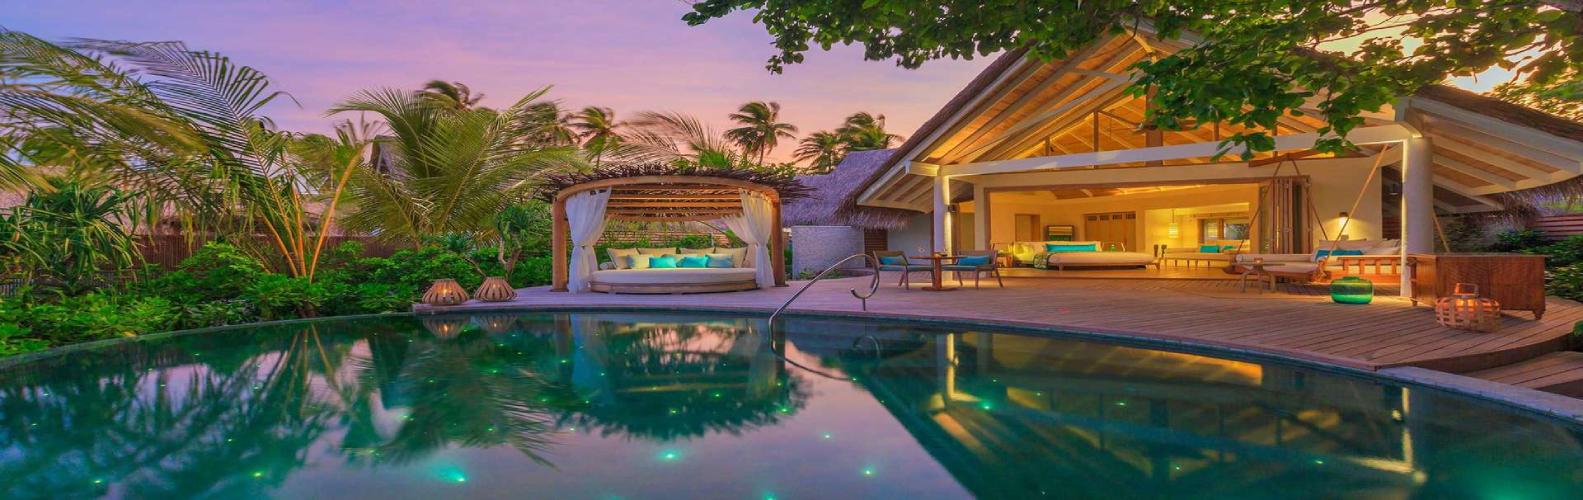 Milaidhoo Island Maldives - Villas